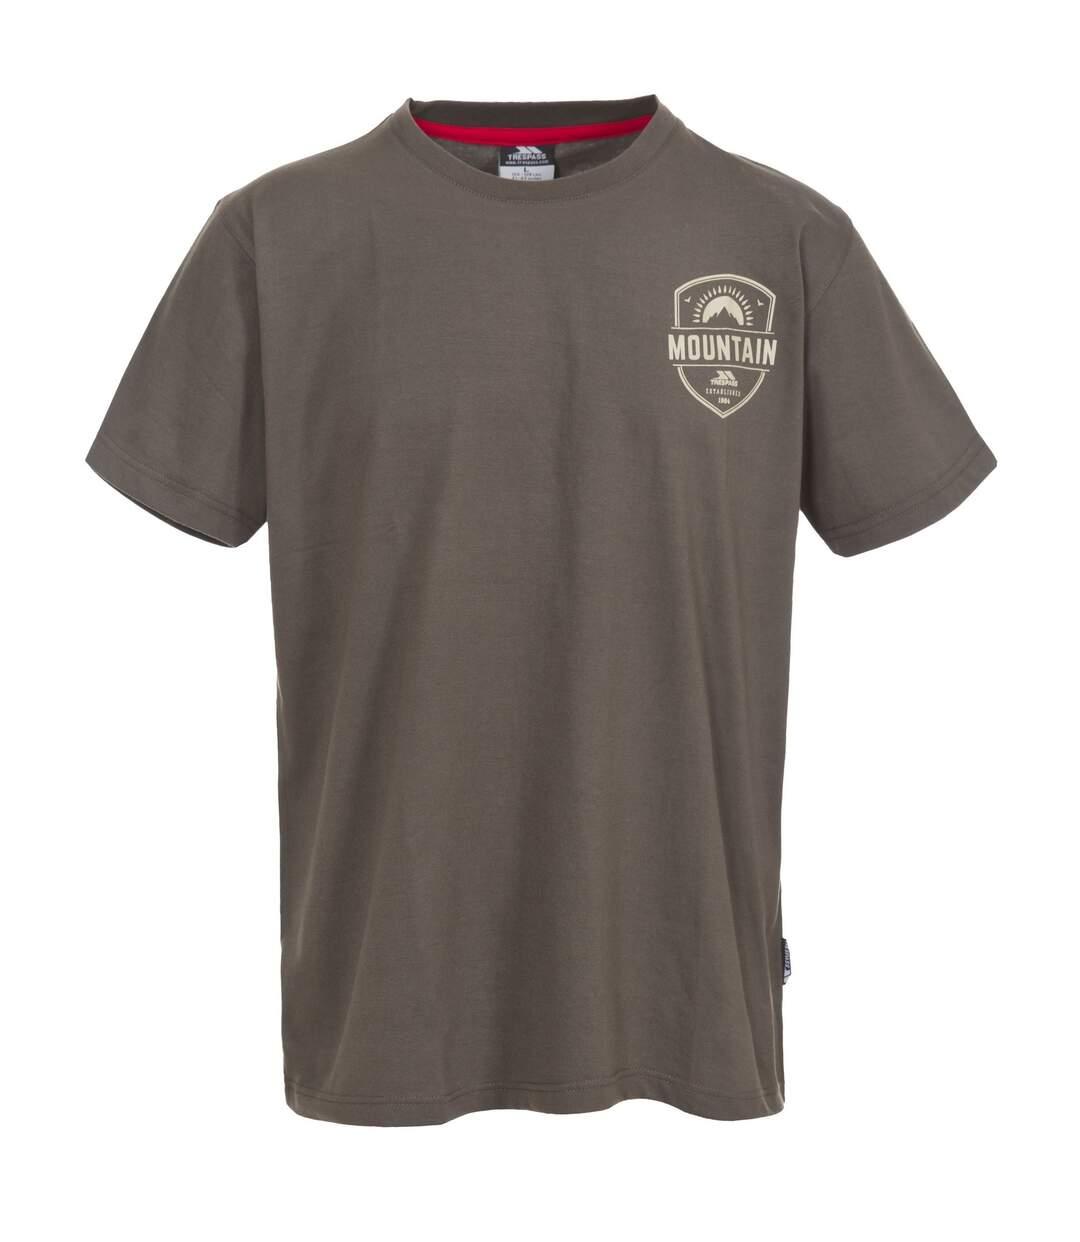 Trespass Mens Rawhider Casual Short Sleeve T-Shirt (Khaki) - UTTP3401